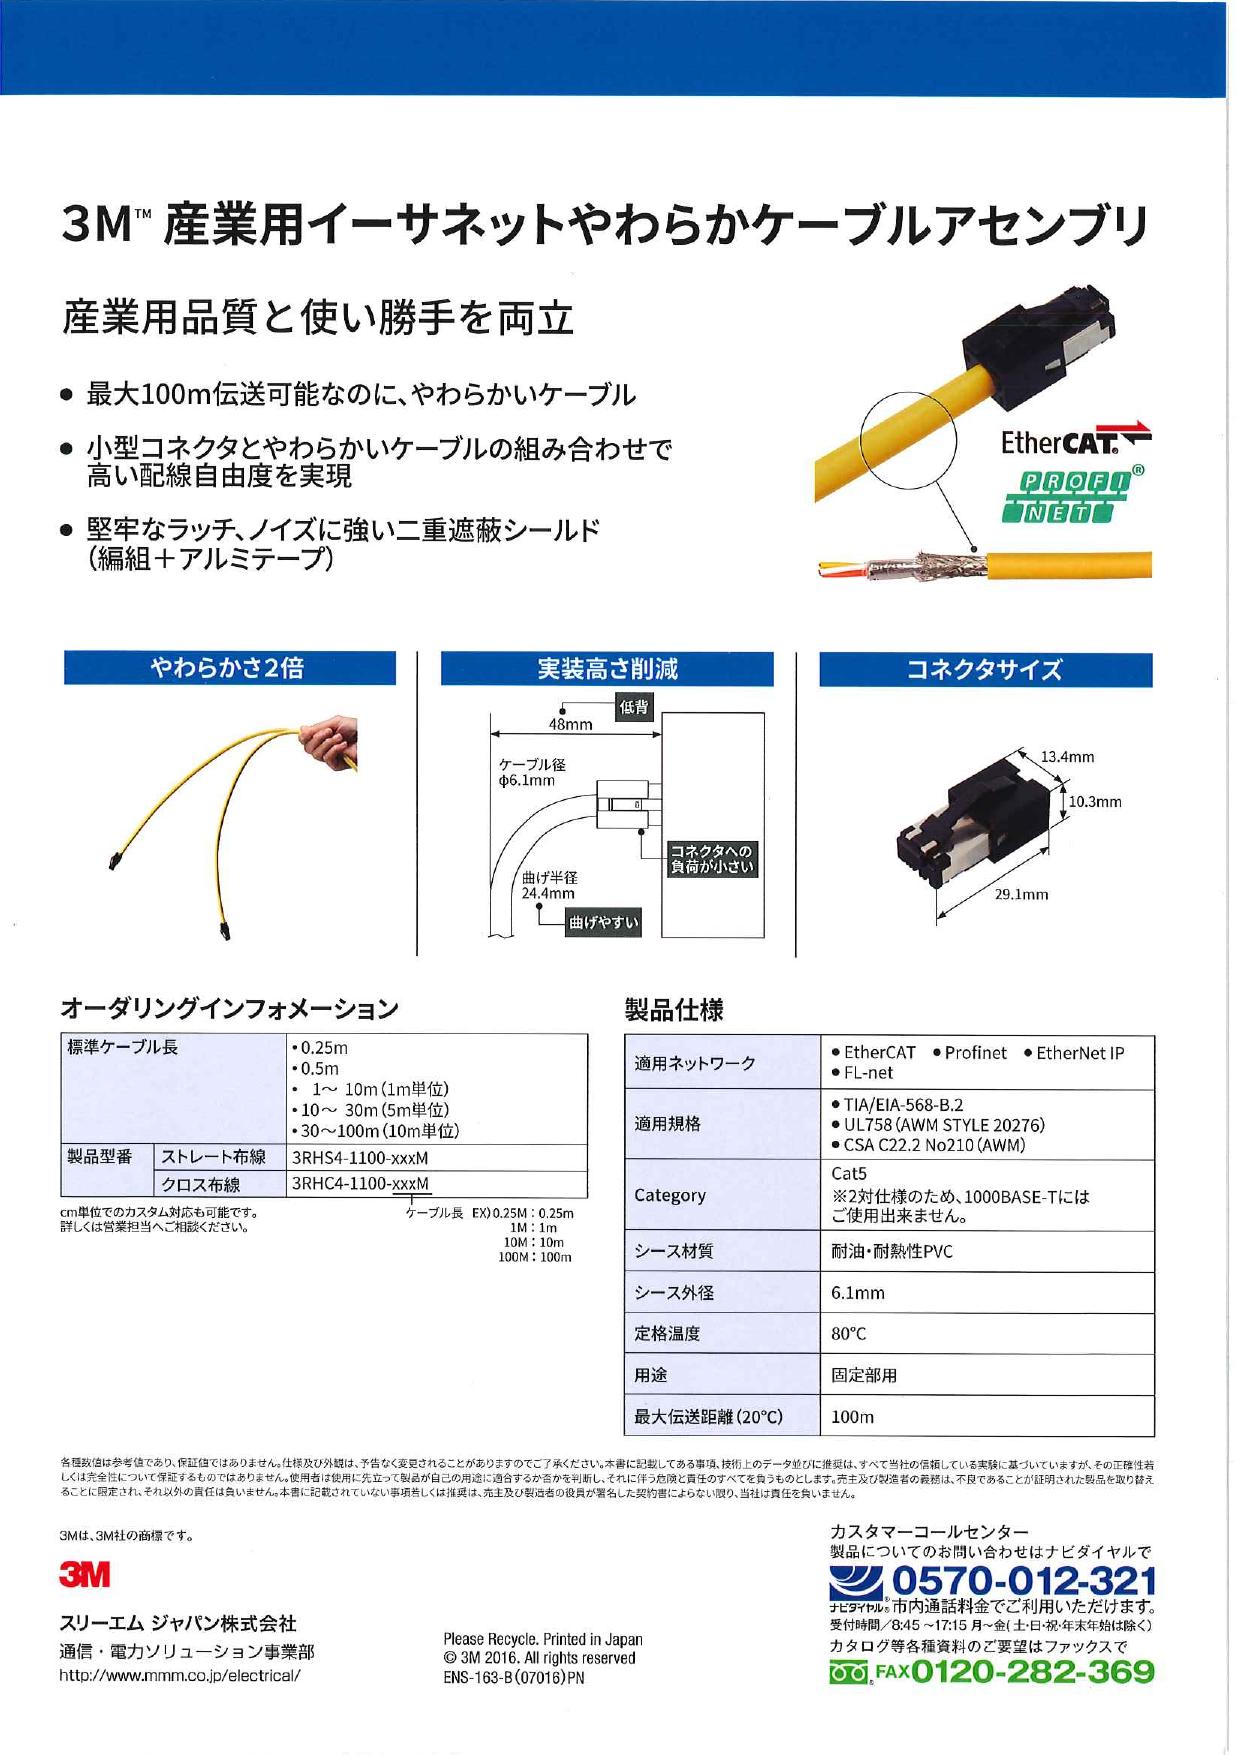 3M(TM)産業用イーサネットやわらかケーブルアセンブリ